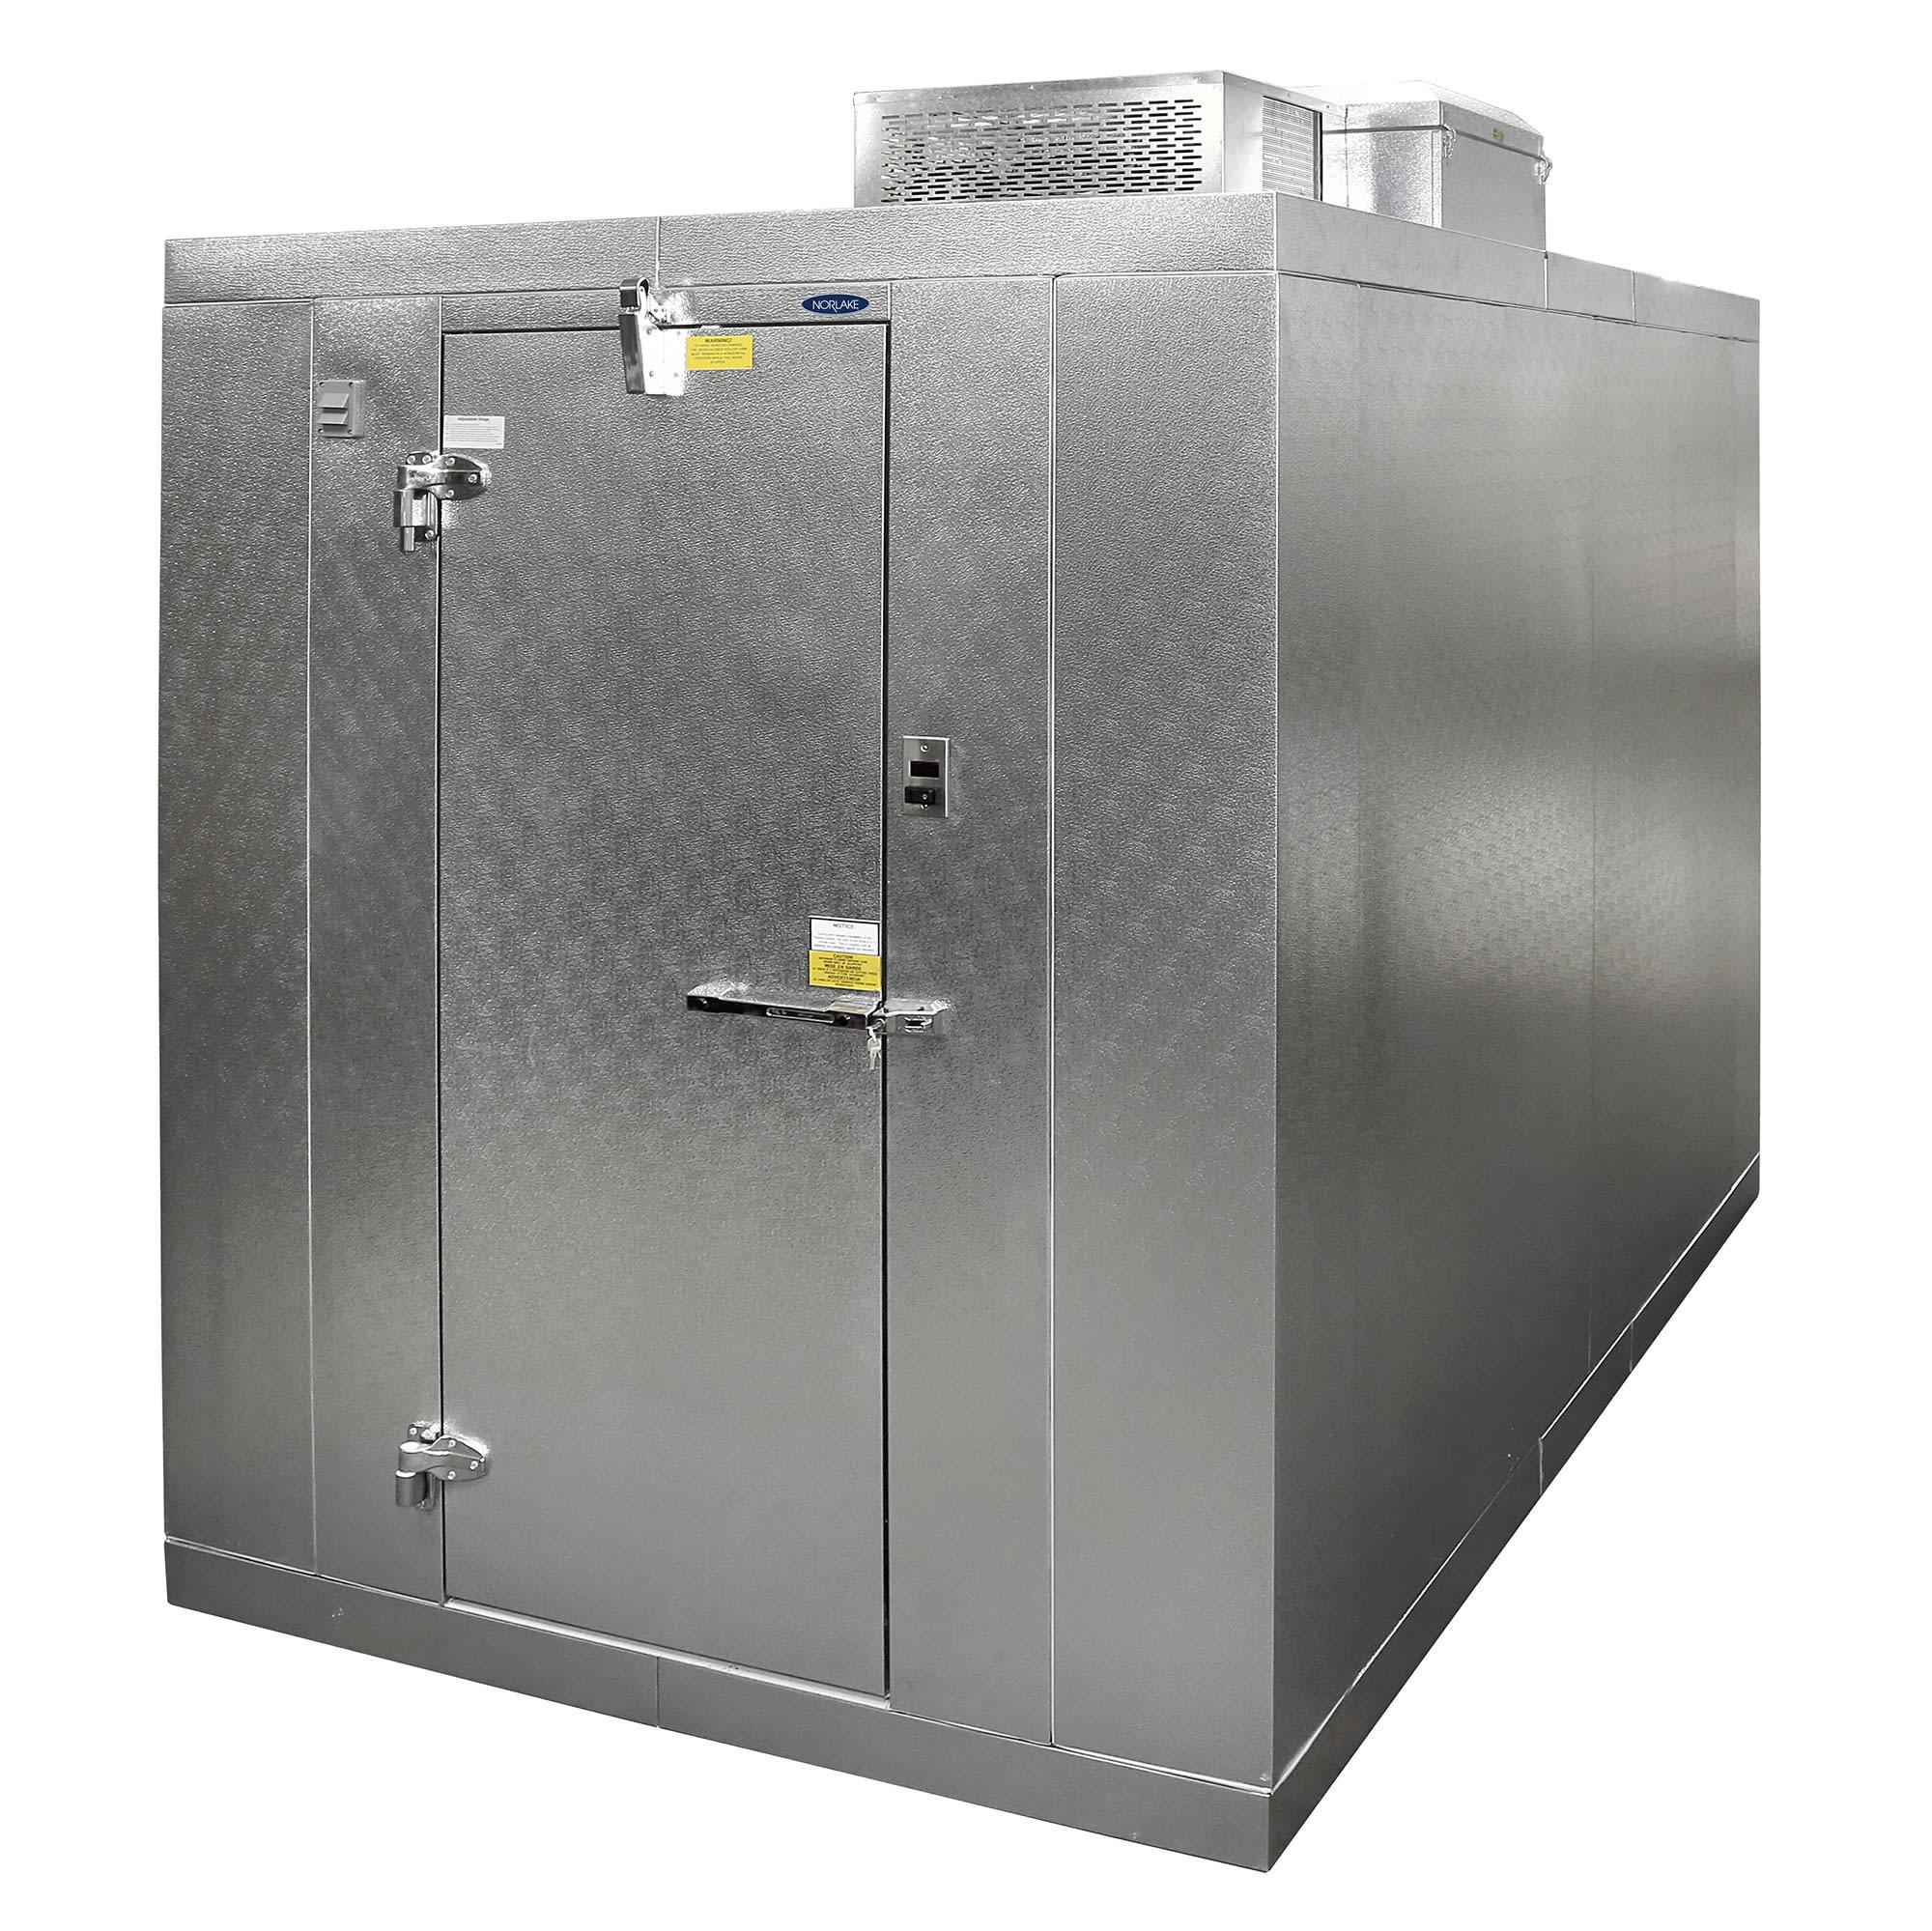 Nor-Lake KLB7488-C L Indoor Walk-In Refrigerator w/ Top M...